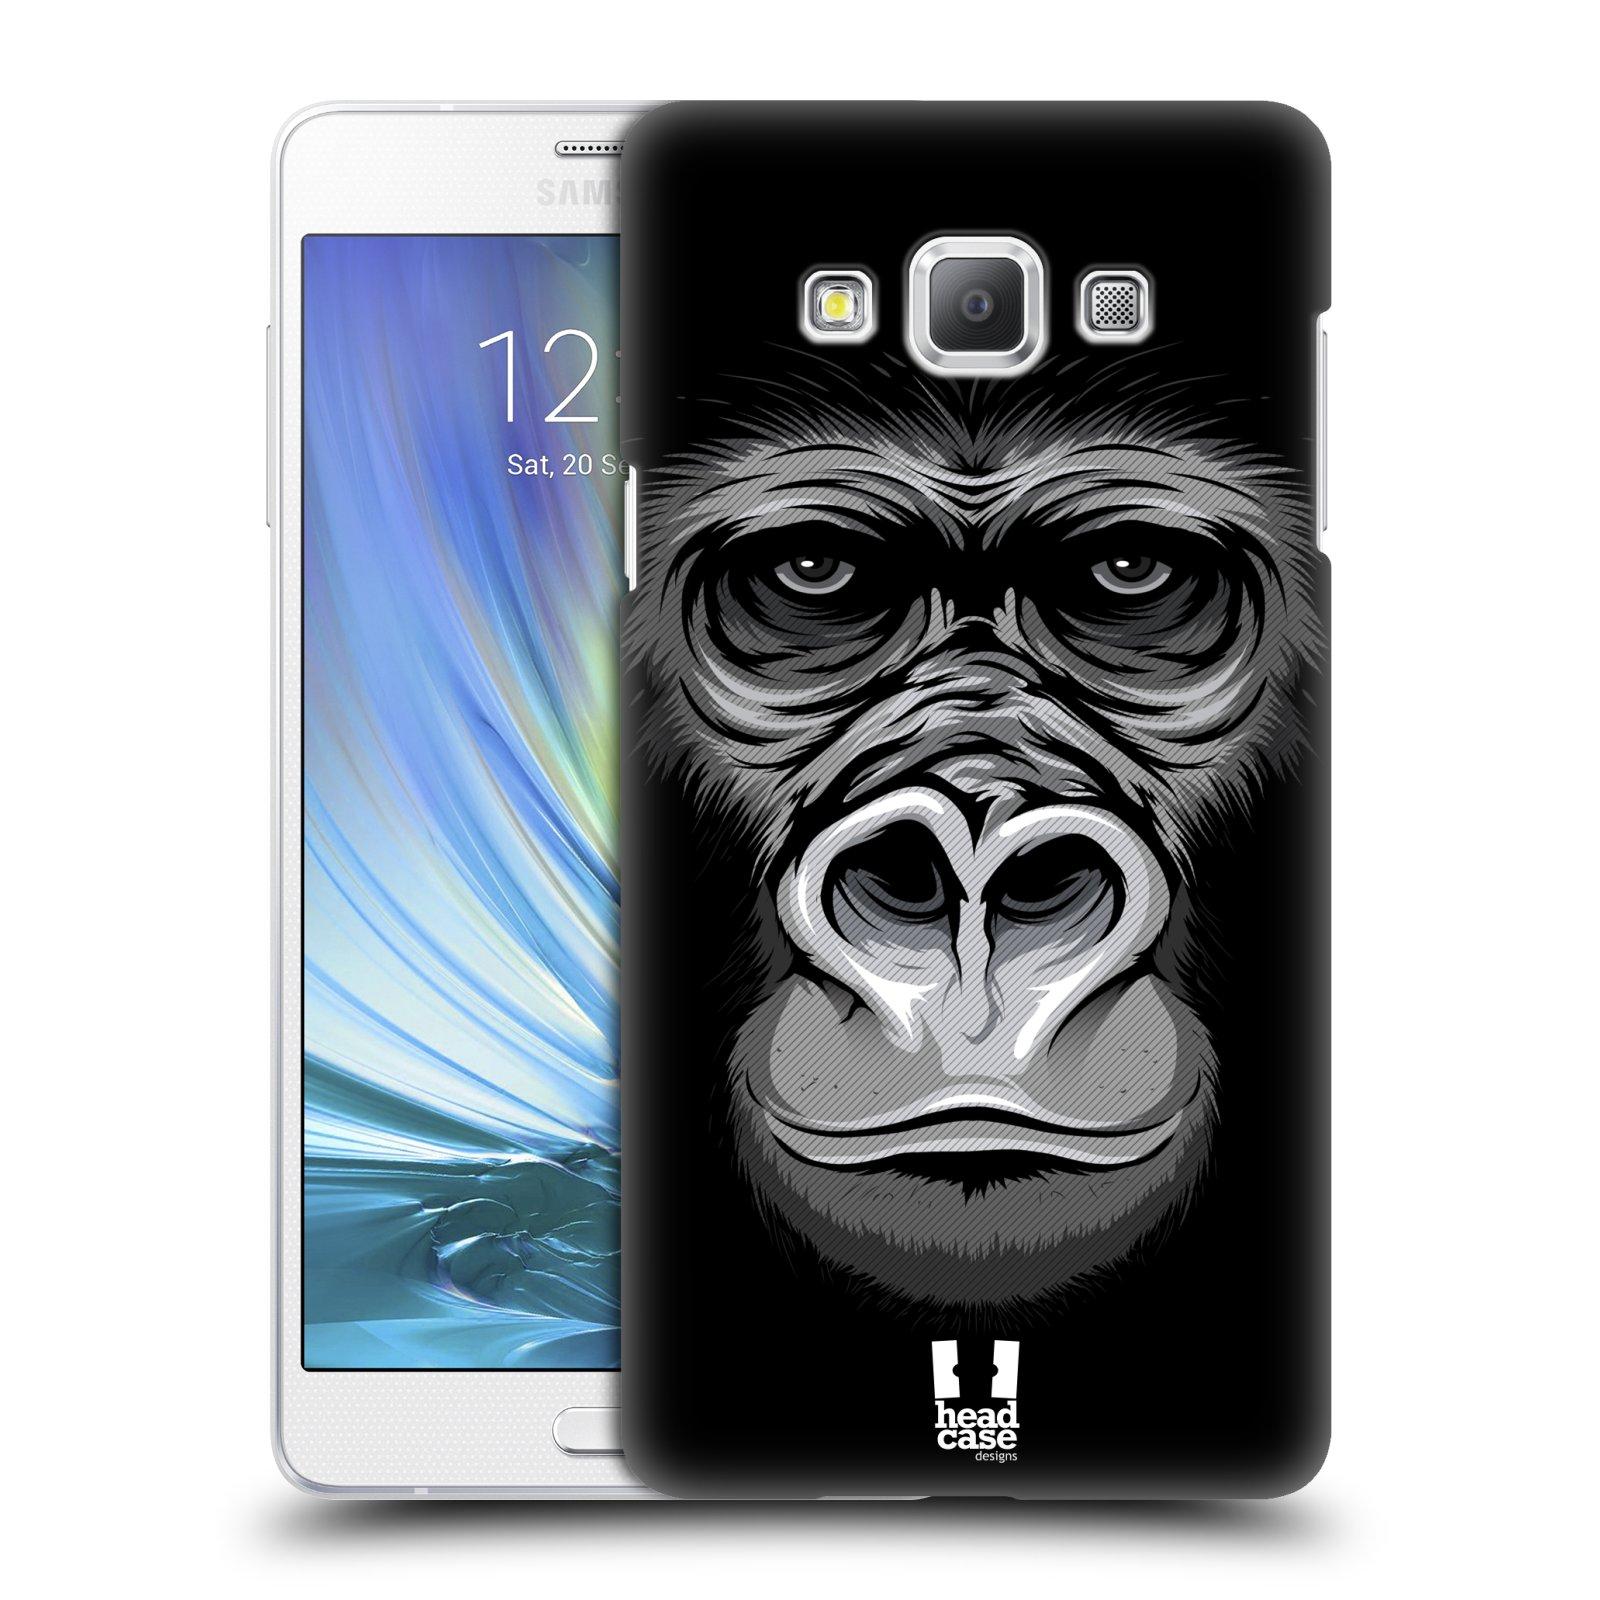 HEAD CASE plastový obal na mobil SAMSUNG GALAXY A7 vzor Zvíře kreslená tvář 2 gorila